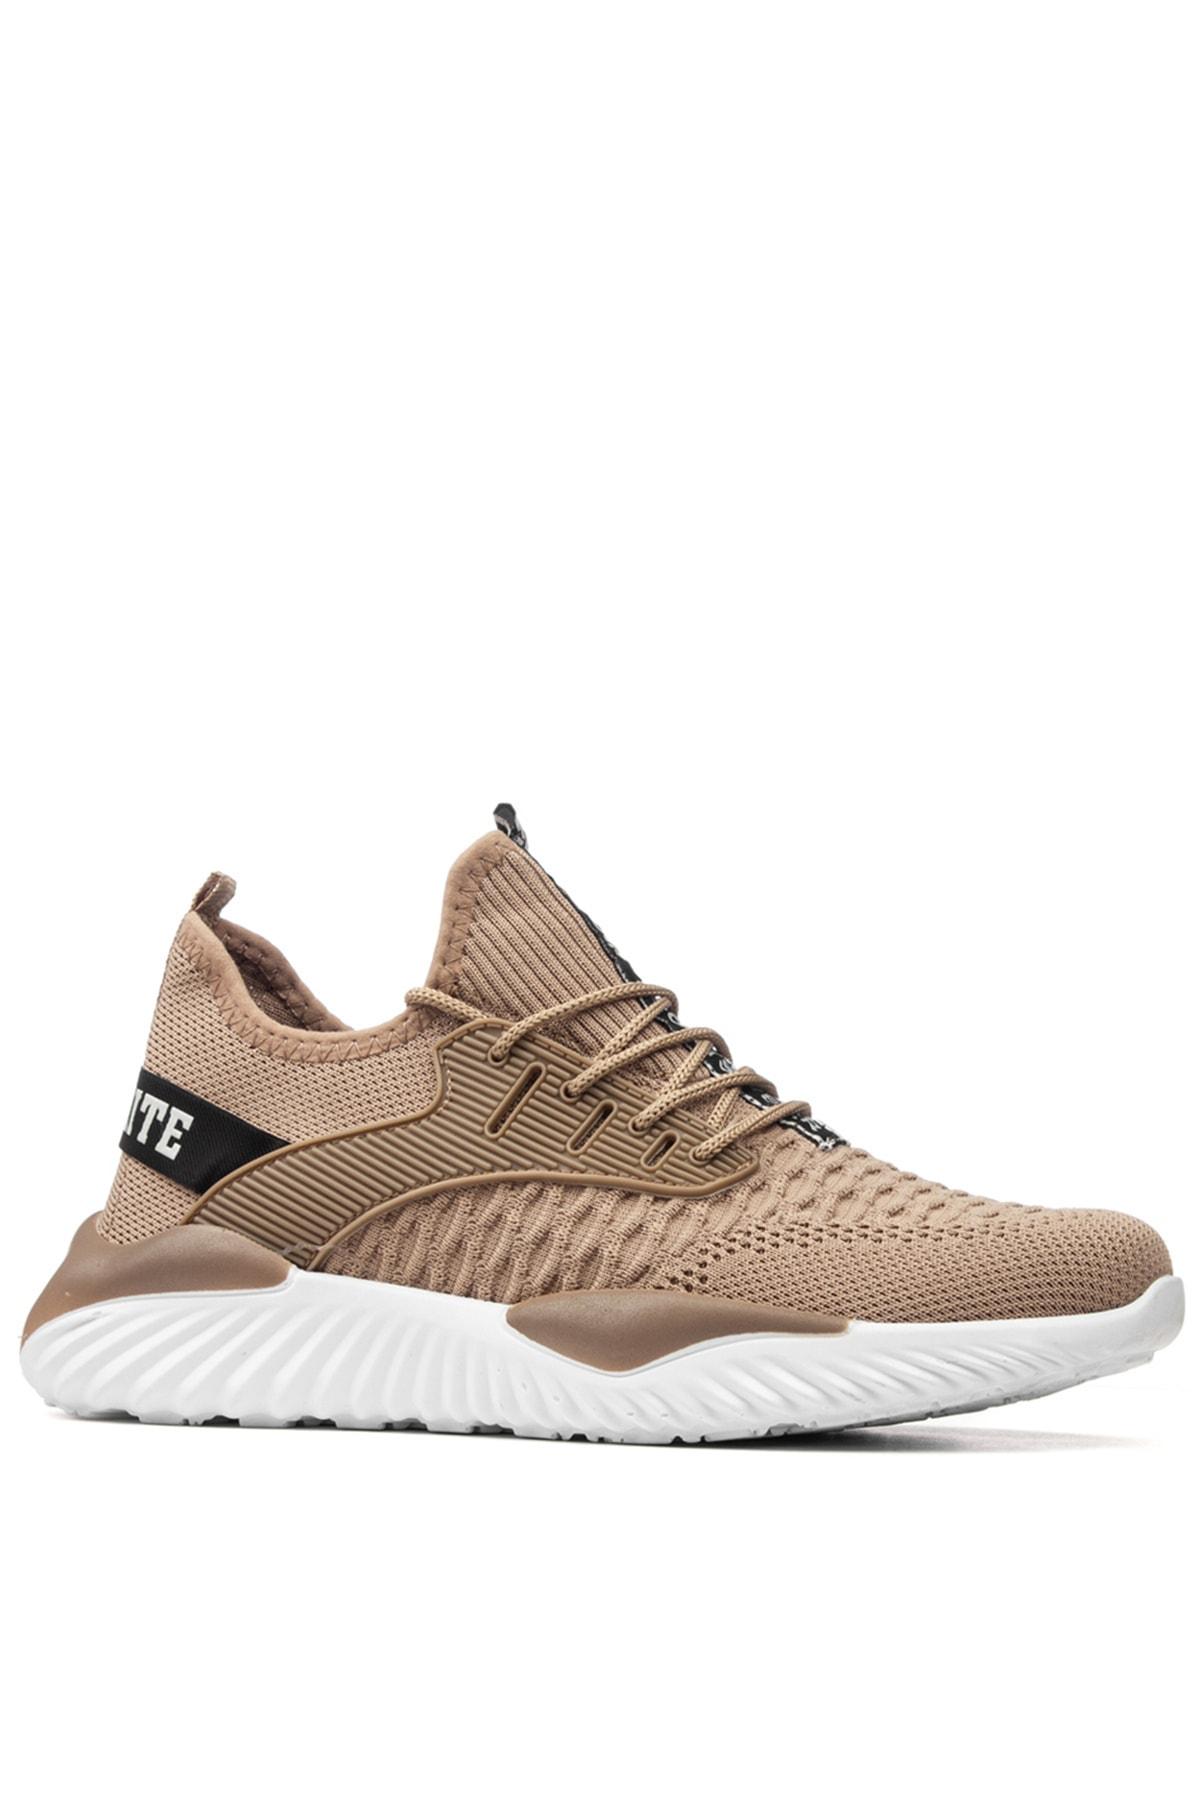 ICELAKE Unisex Triko Sneaker Ayakkabı 085044-01 1